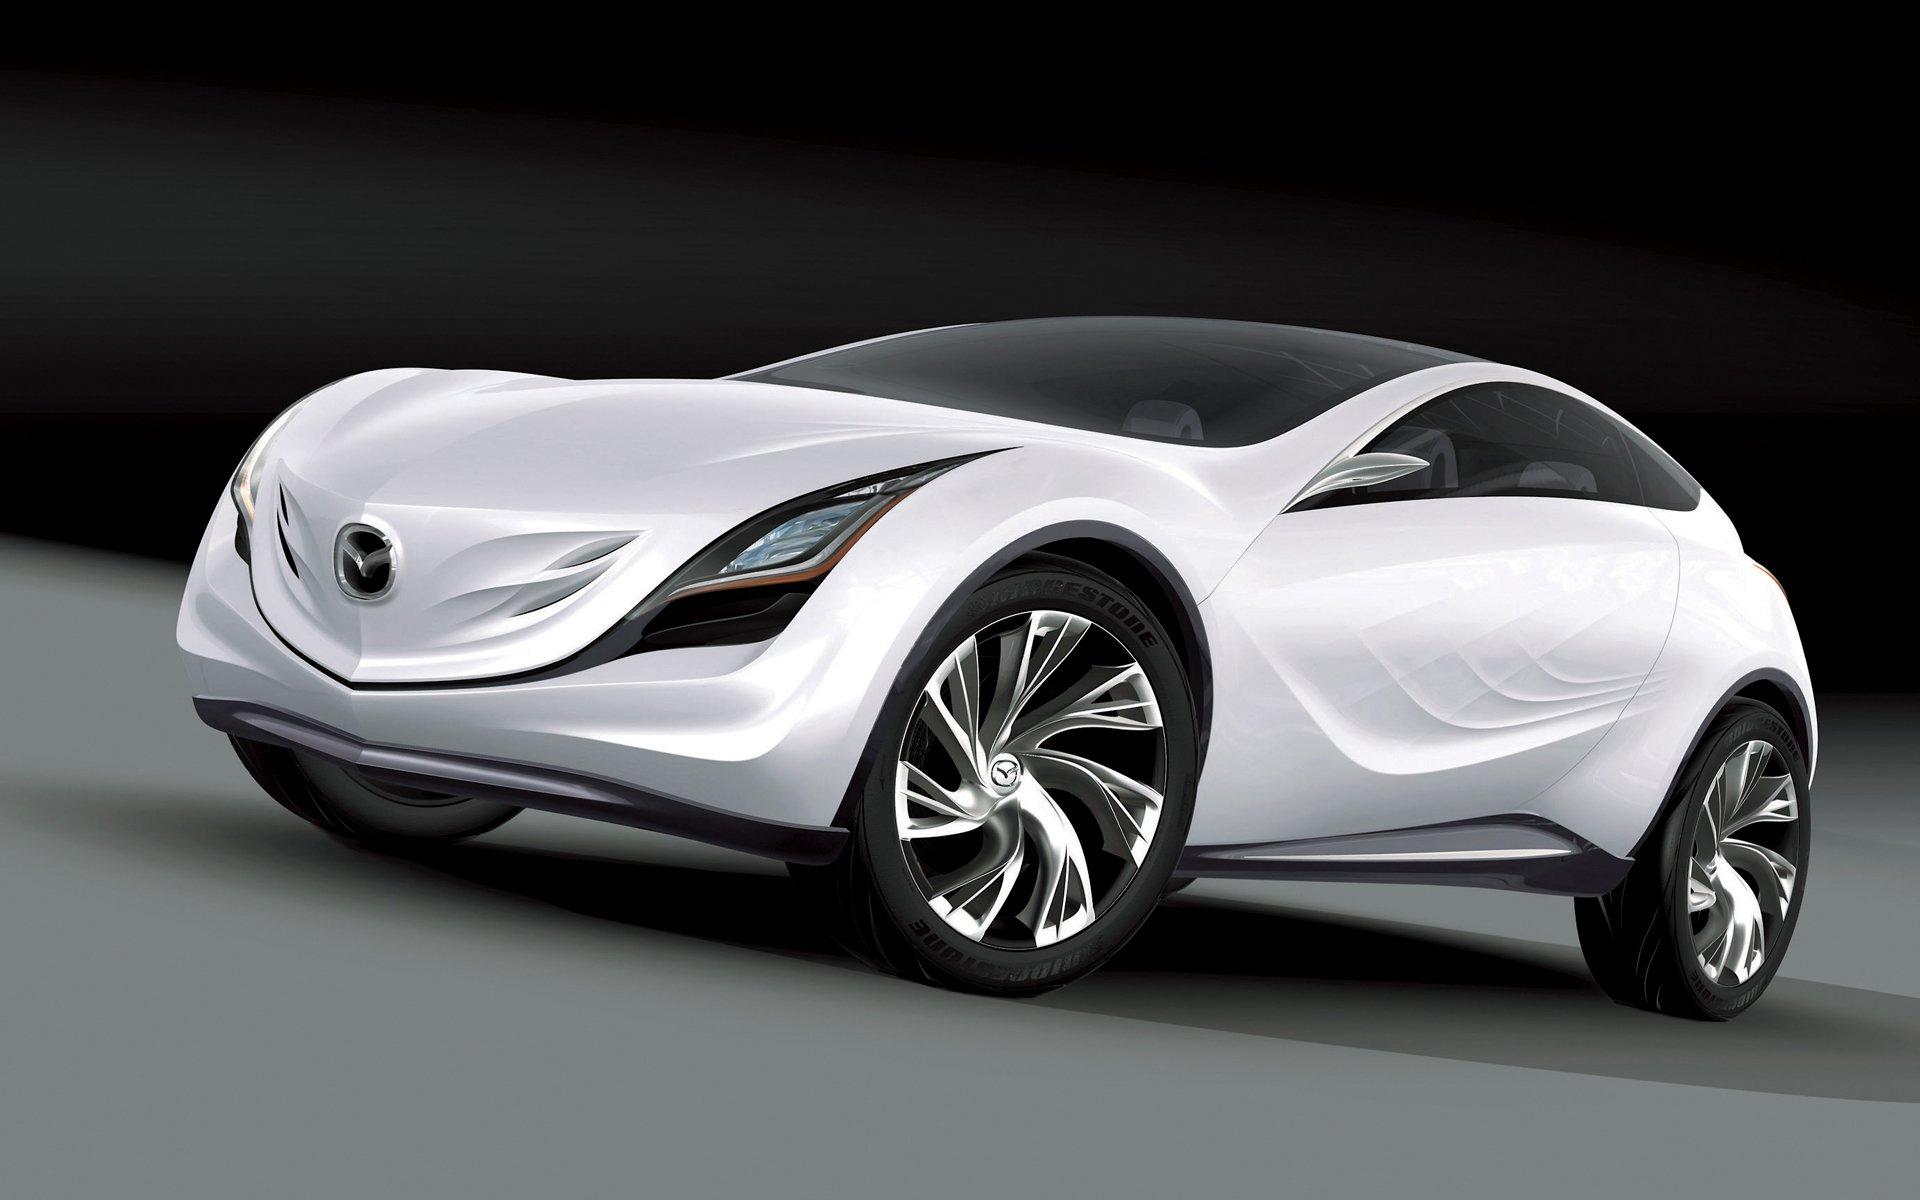 HD Wallpapers Mazda Advanced Sports Car